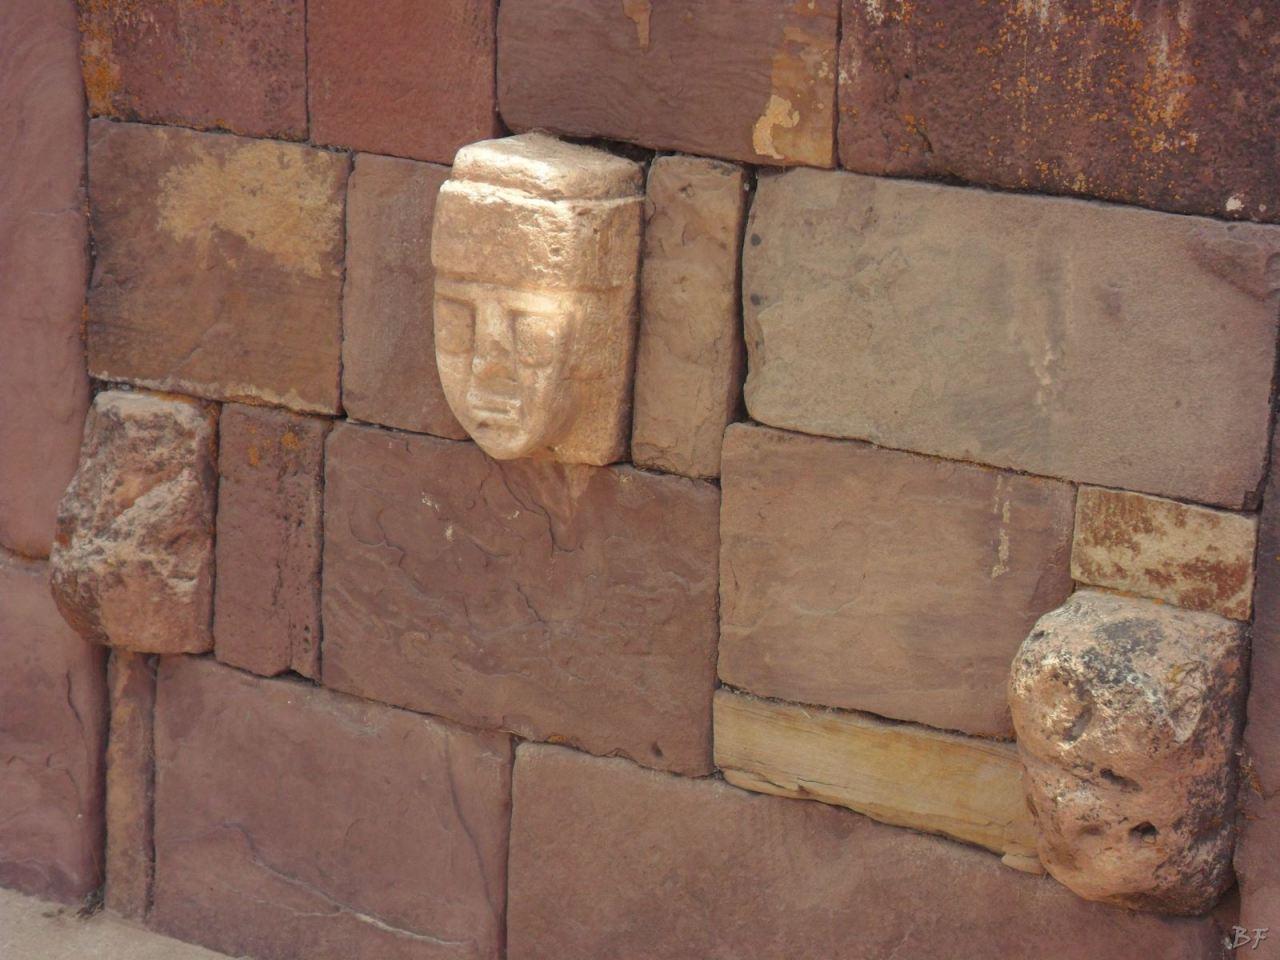 Sito-Megalitico-Piramide-Akapana-Kalasasaya-Menhir-Tiahuanaco-Bolivia-82